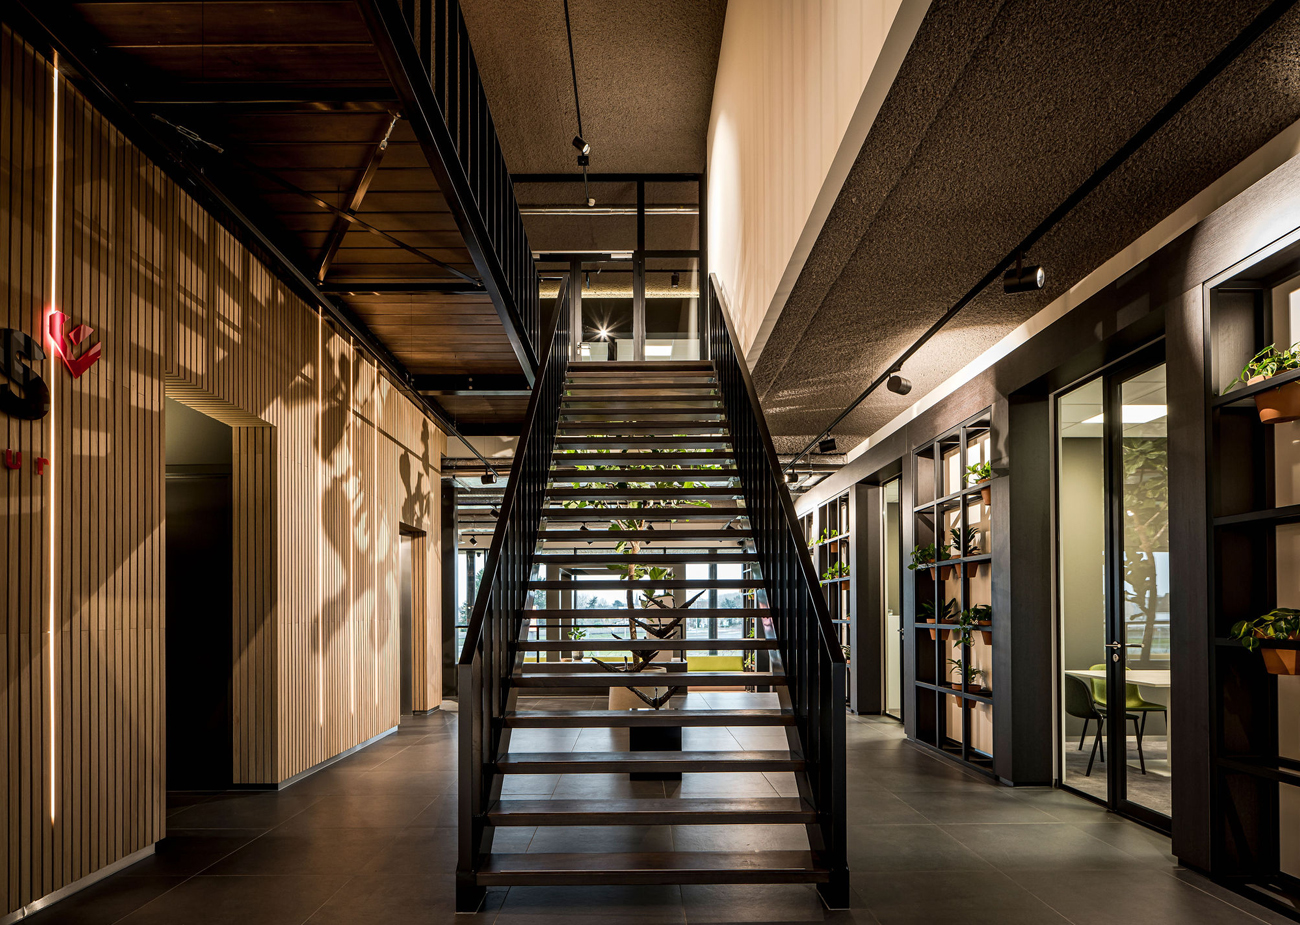 Interieurarchitect Stan Wildenberg industrieel kantoor Lomans totaalinstallateur Capelle interieur ontwerp trap vide